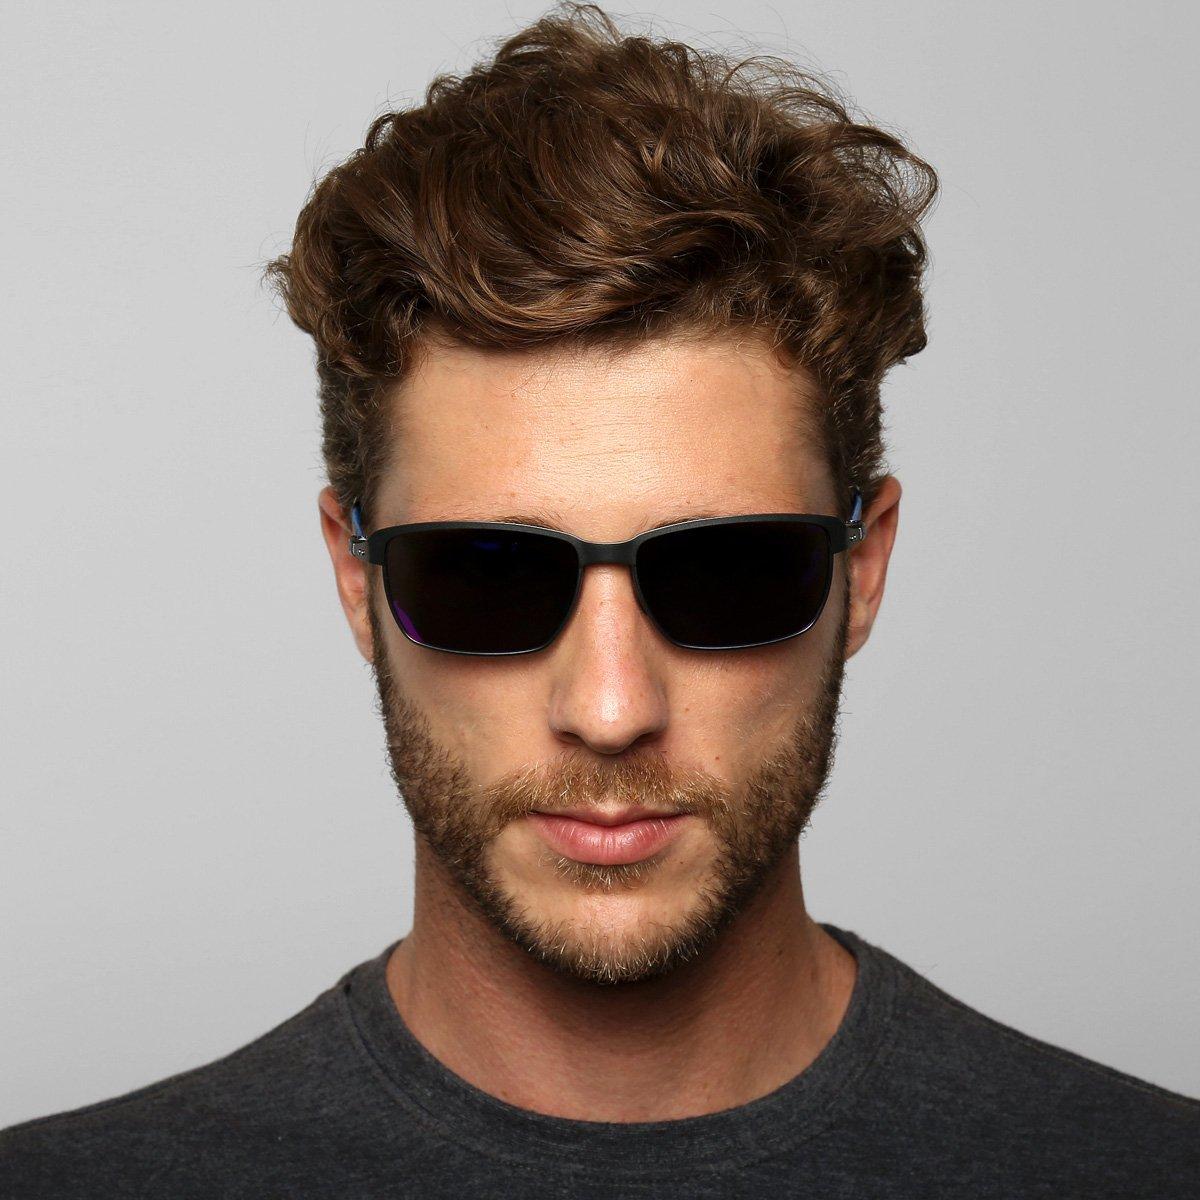 418061a27e941 Óculos Oakley Tinfoil Carbon - Iridium - Compre Agora   Netshoes